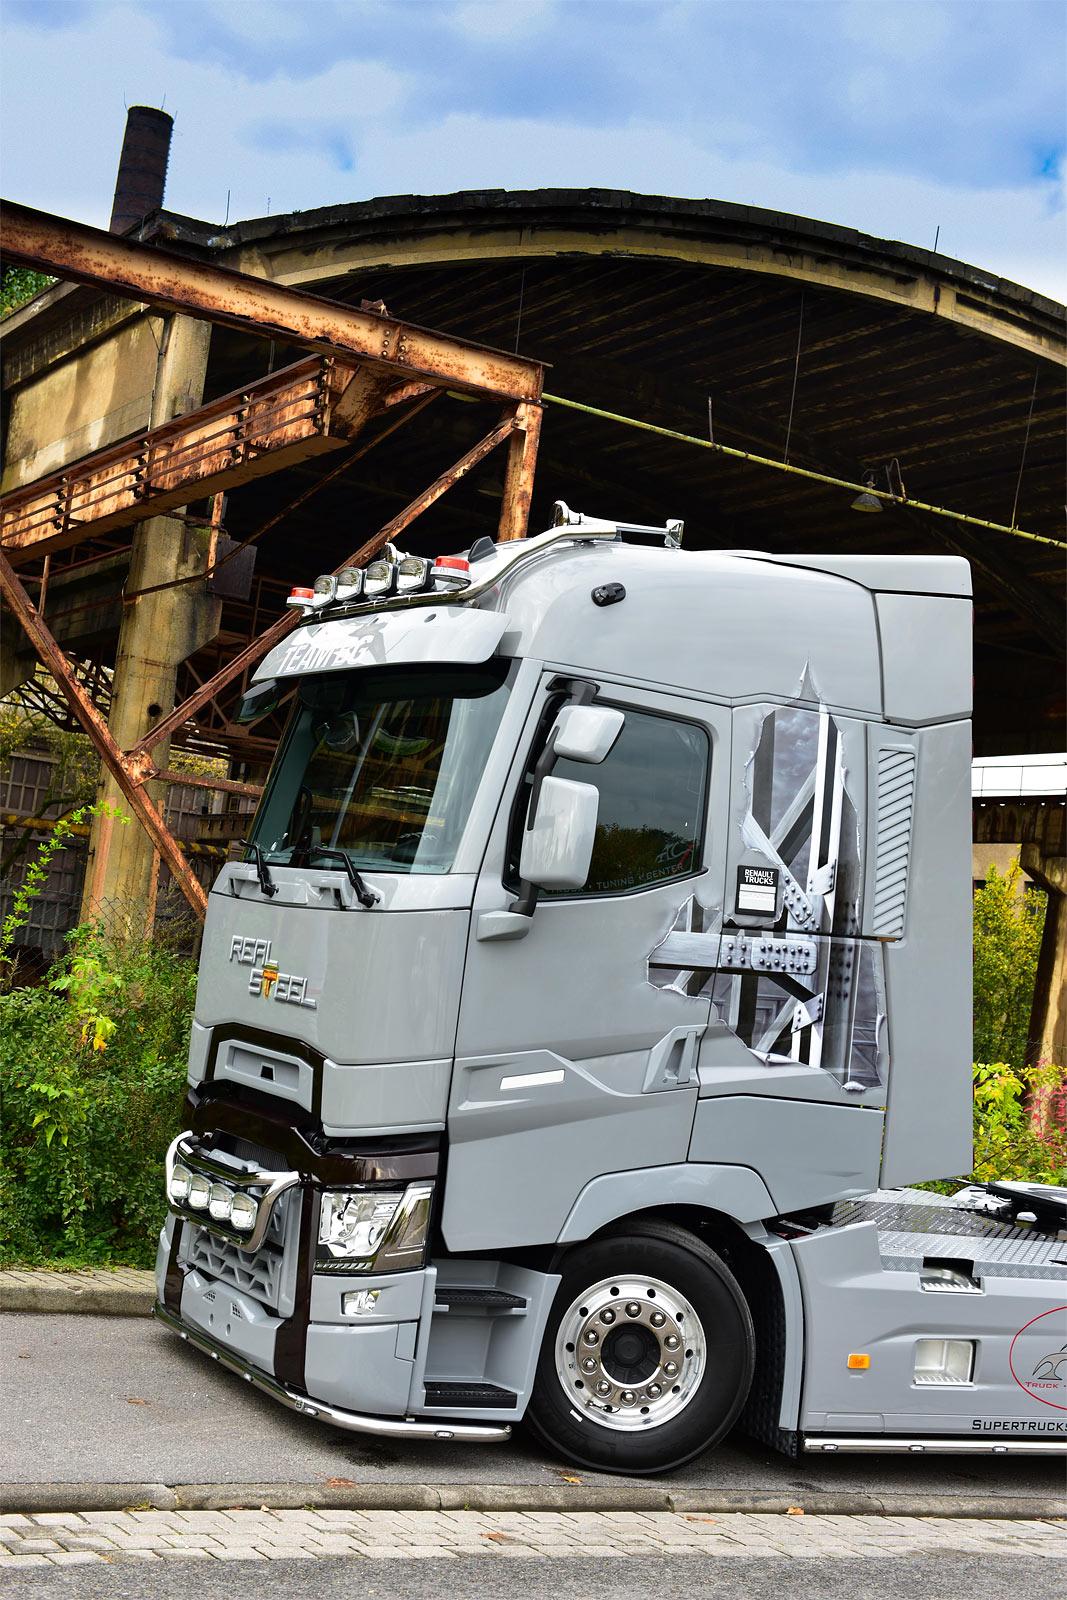 renault t high 520 real steel limited editions trucksplanet. Black Bedroom Furniture Sets. Home Design Ideas